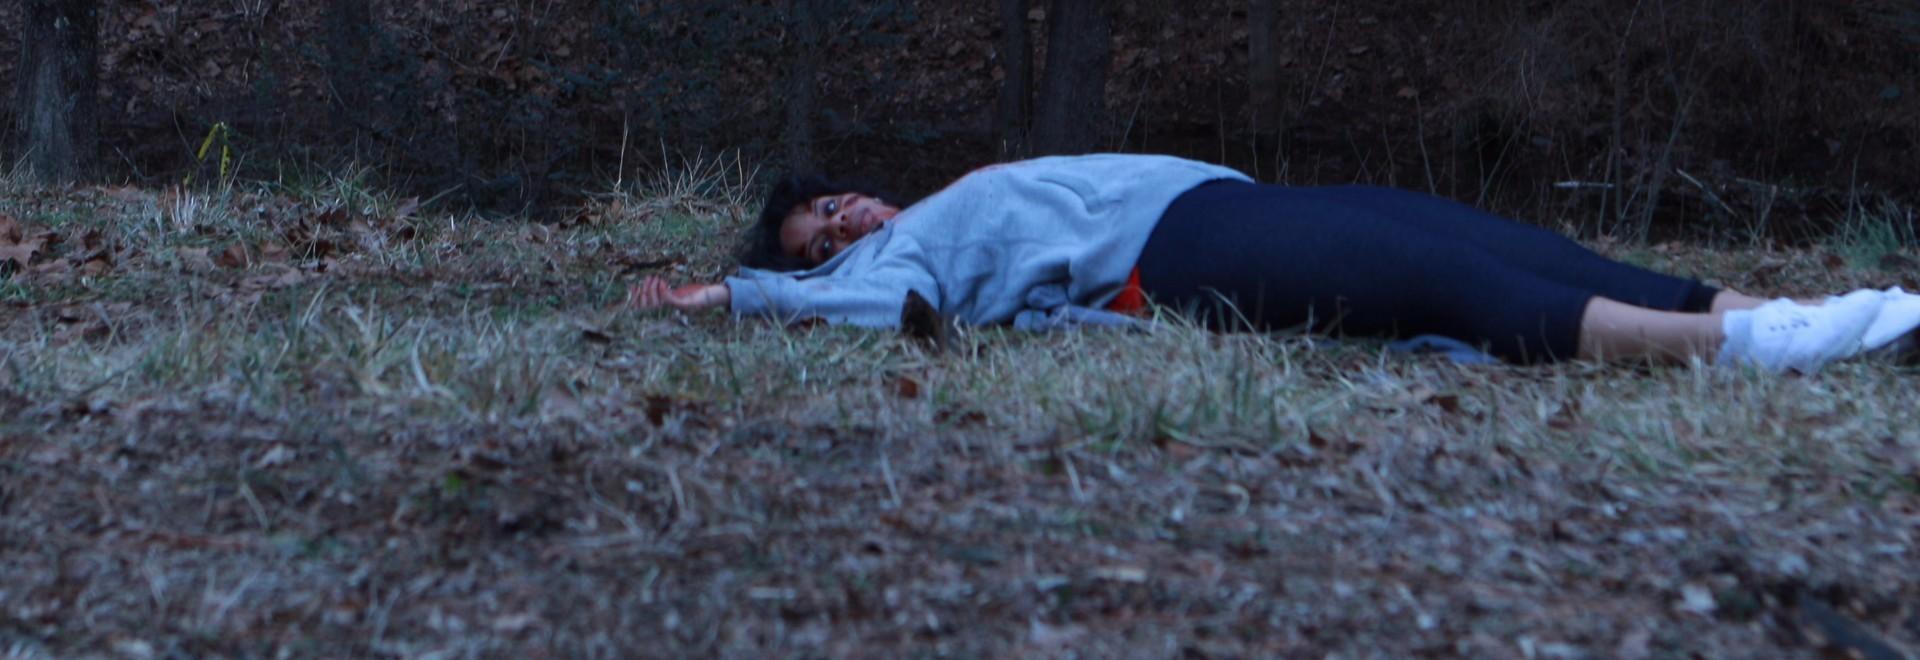 Eroe caduto